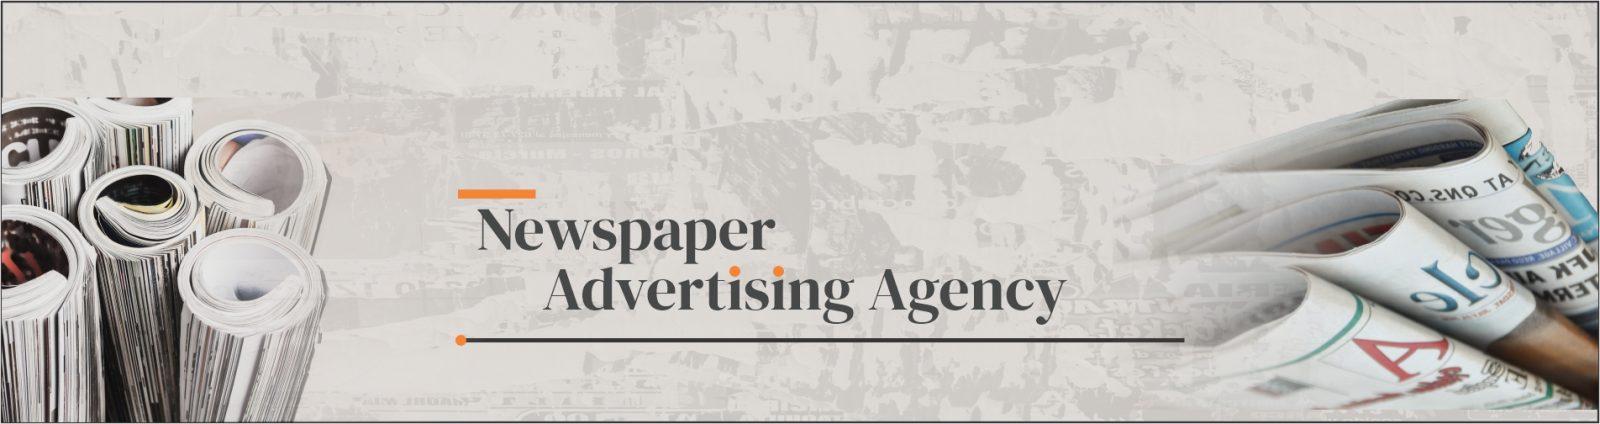 newspaper Advertising Agency in Chandigarh, India